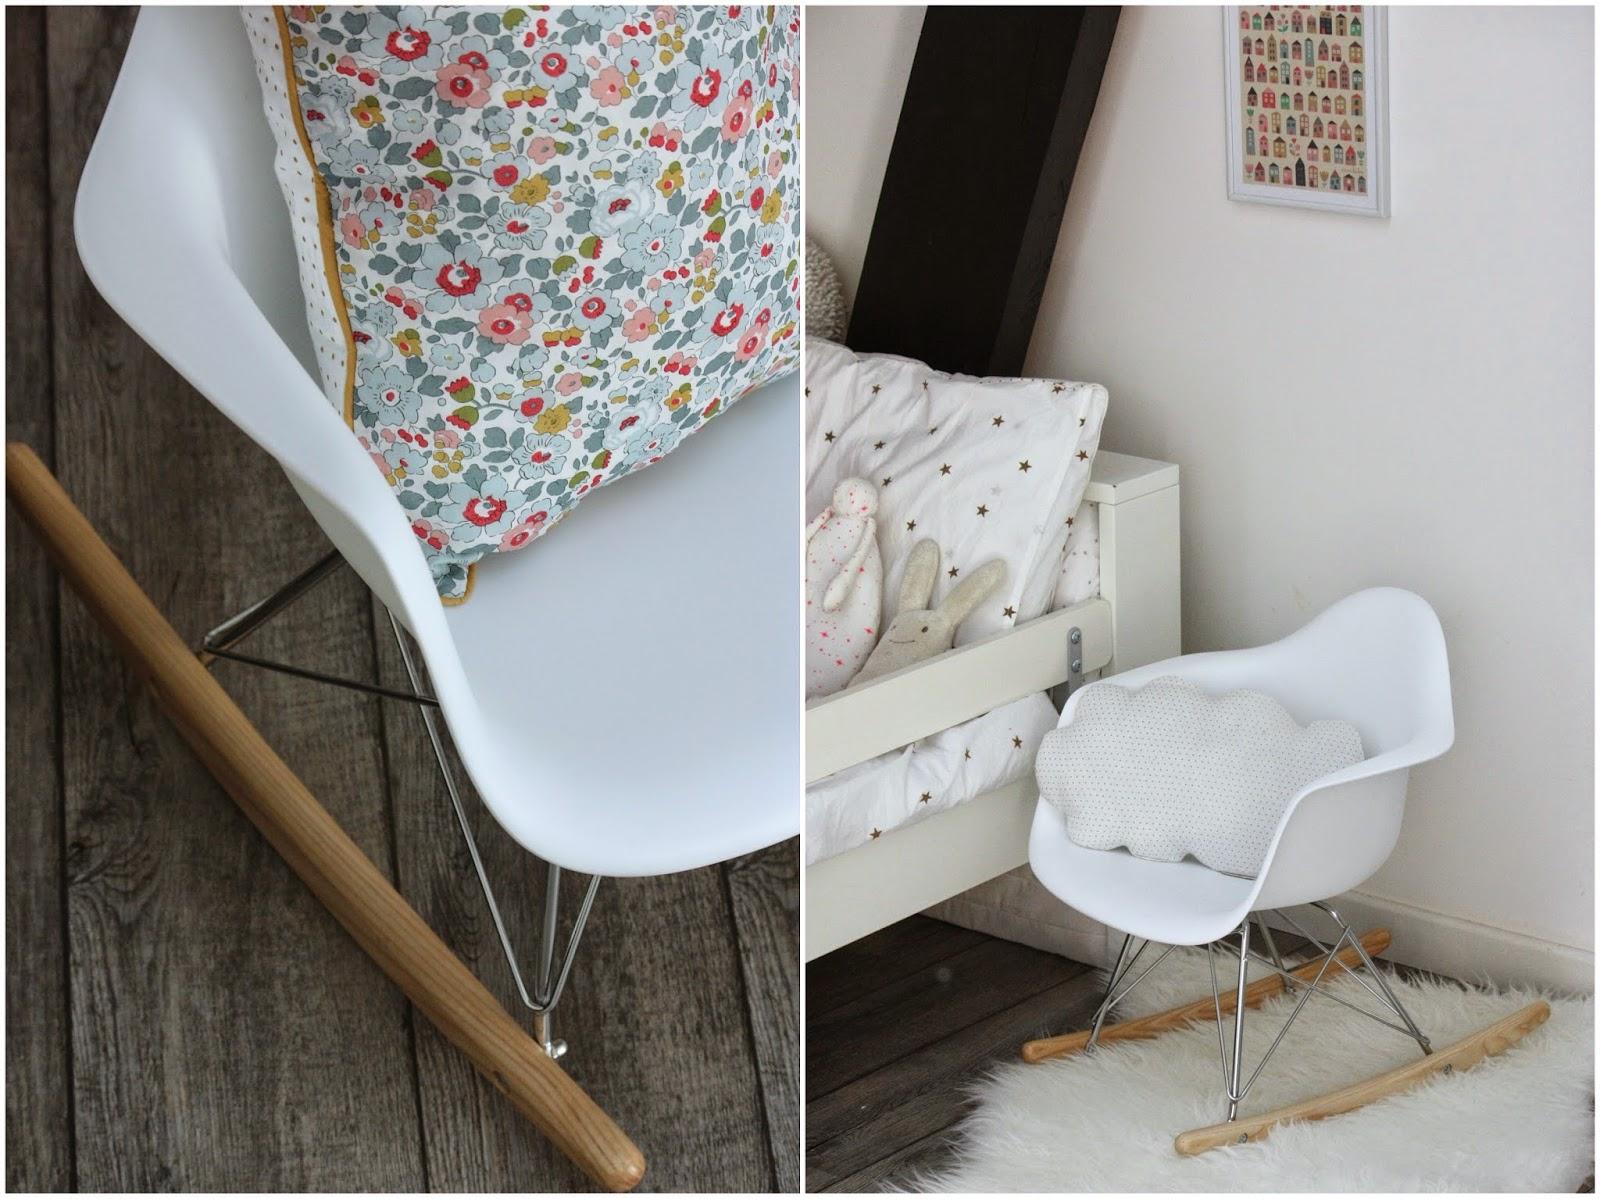 fauteuil a bascule chambre bebe fauteuil a bascule chambre bebe 7128jpg mobilier 1000 id es. Black Bedroom Furniture Sets. Home Design Ideas